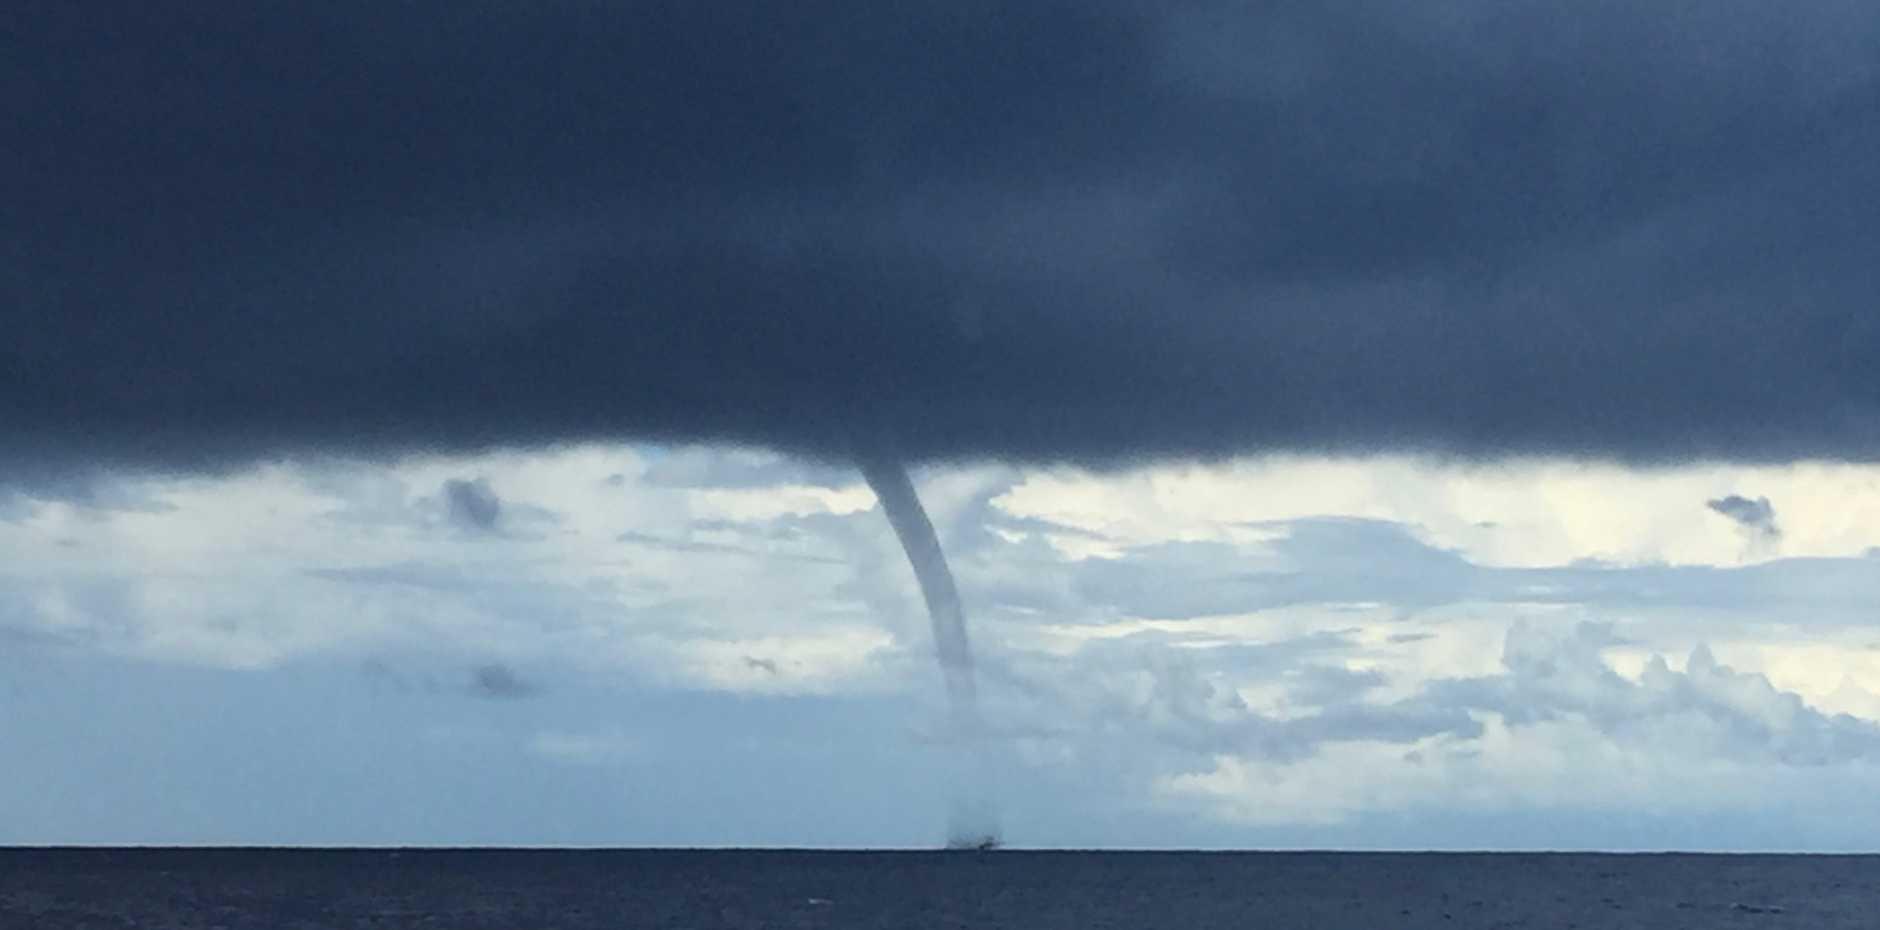 A tornado off the Sunshine Coast appears to engulf a fishing trawler.